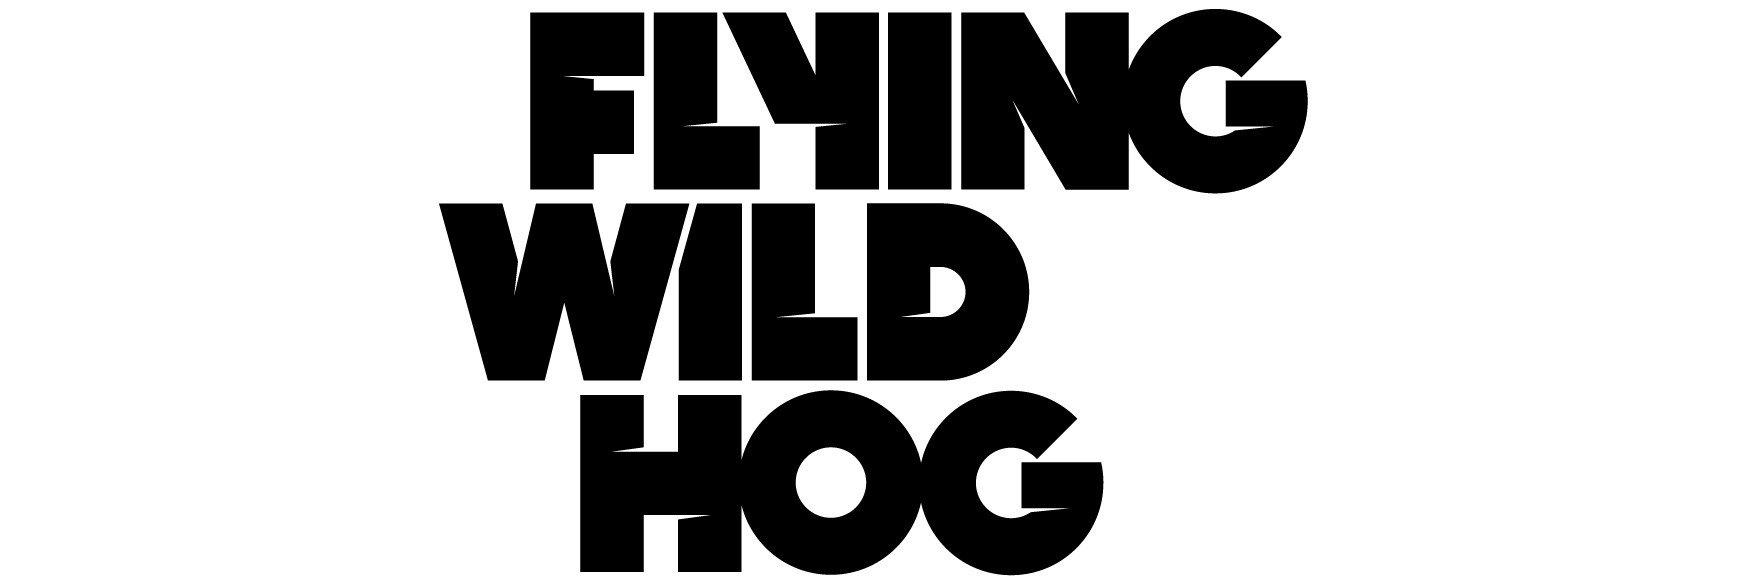 Embracer Group przejmuje studio Flying Wild Hog od Supernova Capital